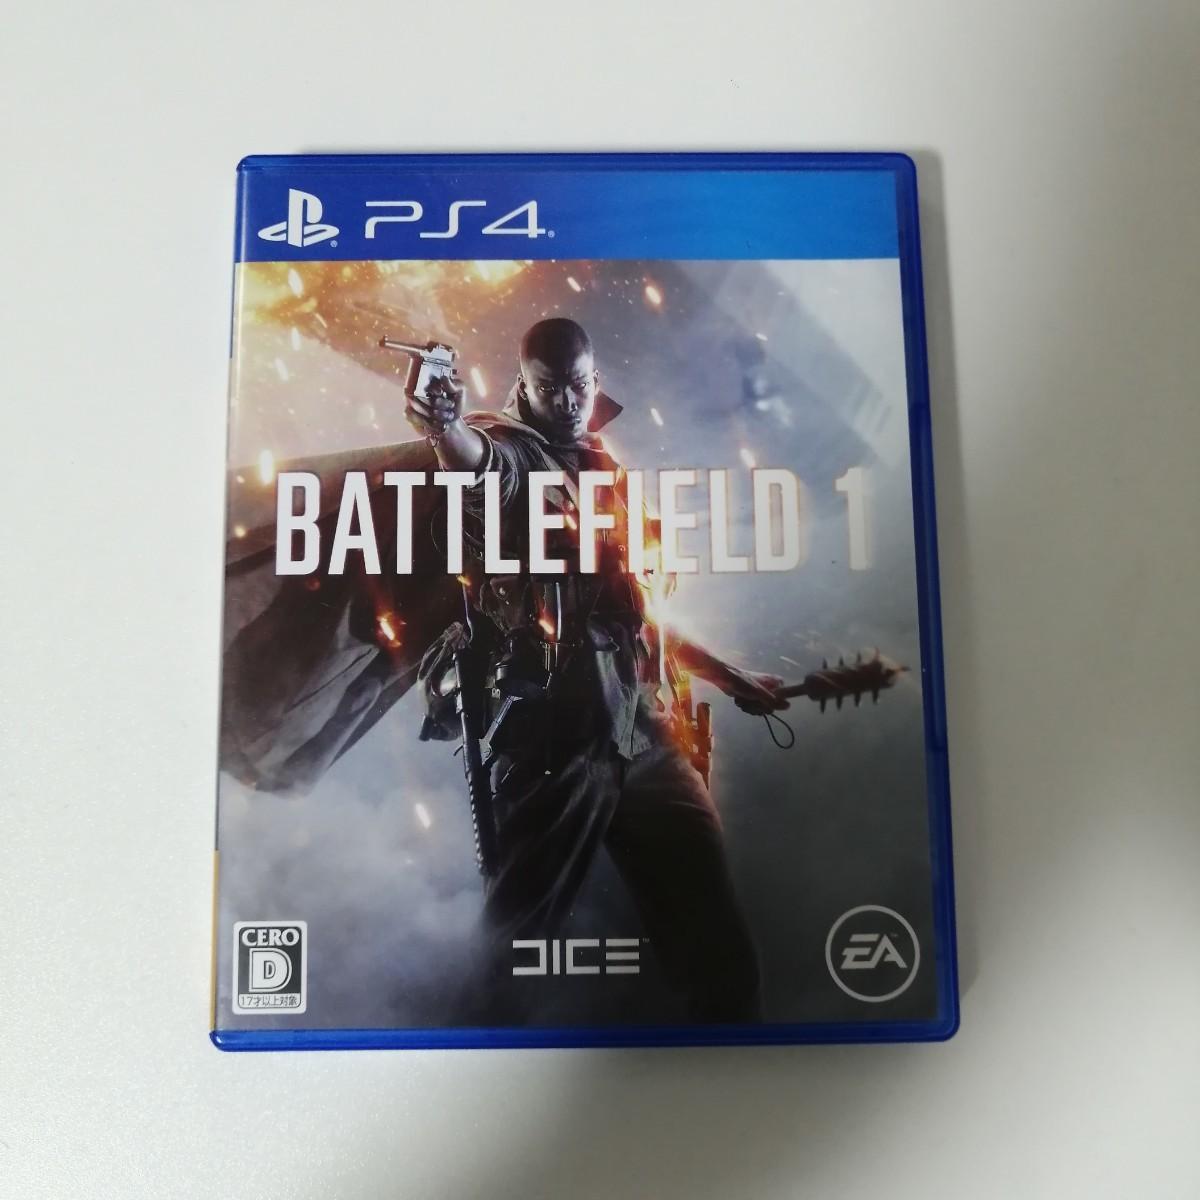 PS4ソフト バトルフィールド1 BATTLE FIELD 1